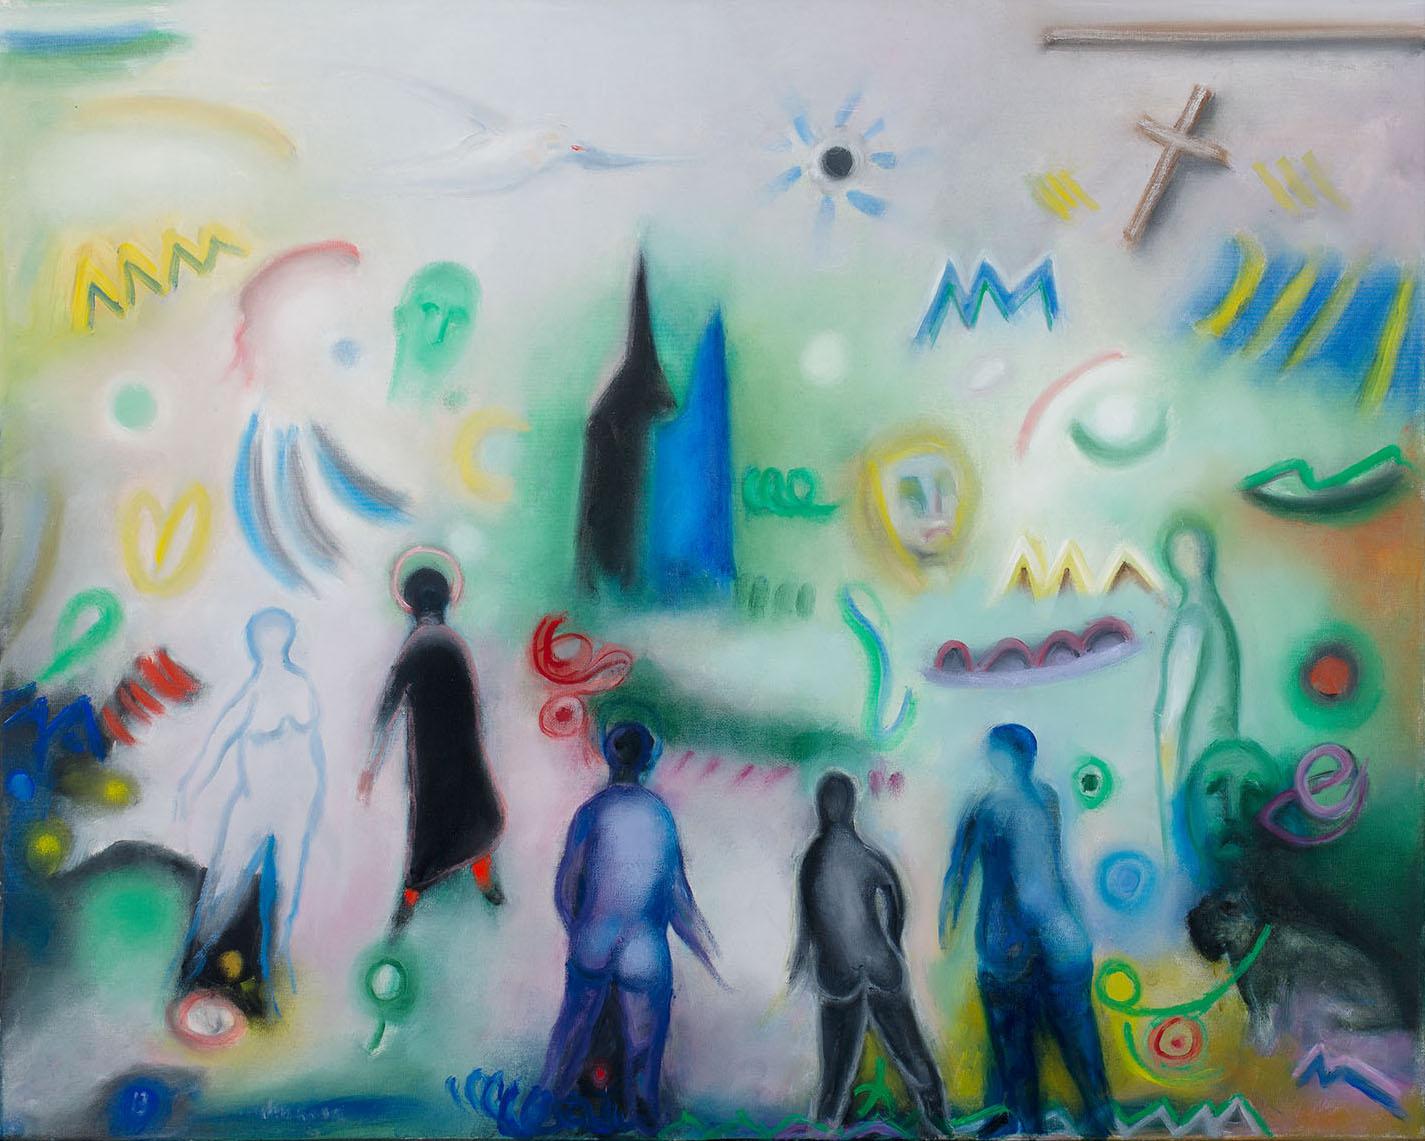 Daydream, 2012-2014, oil on canvas, cm 81 x 65